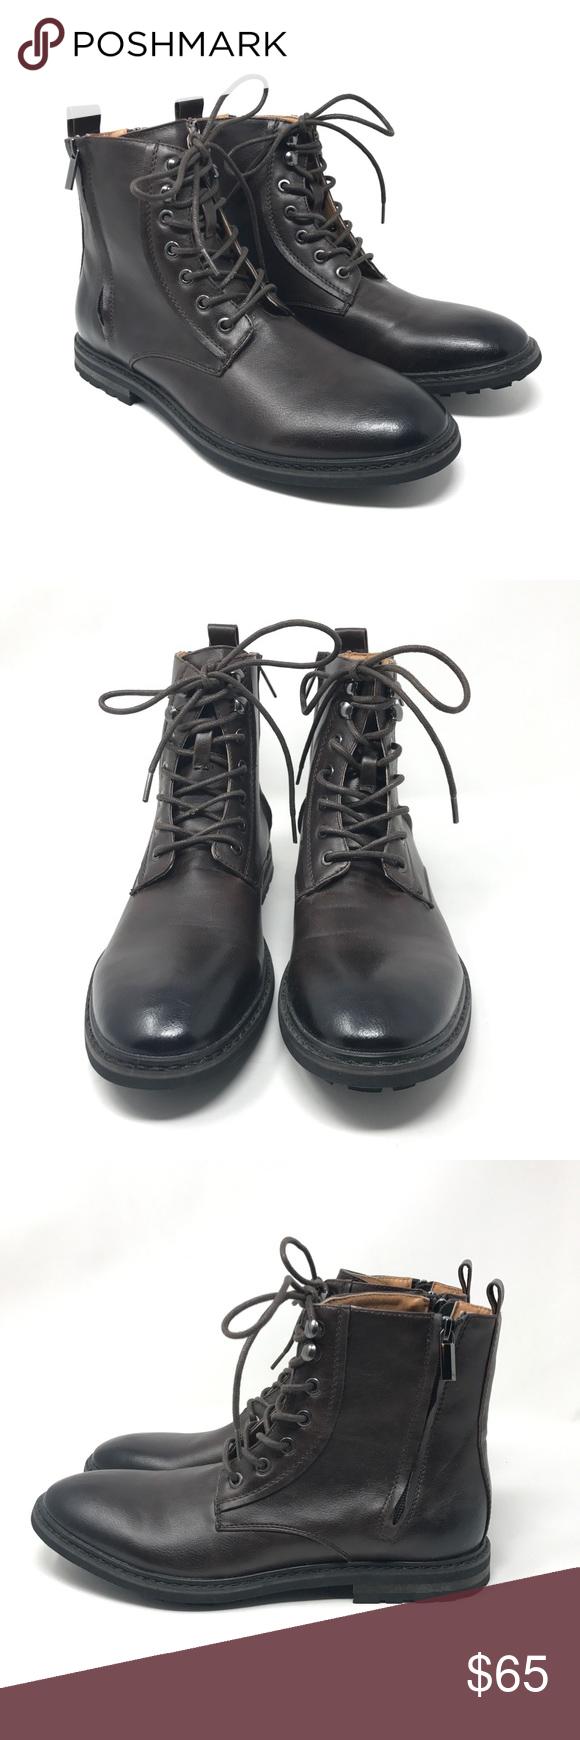 8ff29765c3f Robert Wayne Thatcher brown leather Lace Up size 8 | My Posh Picks ...